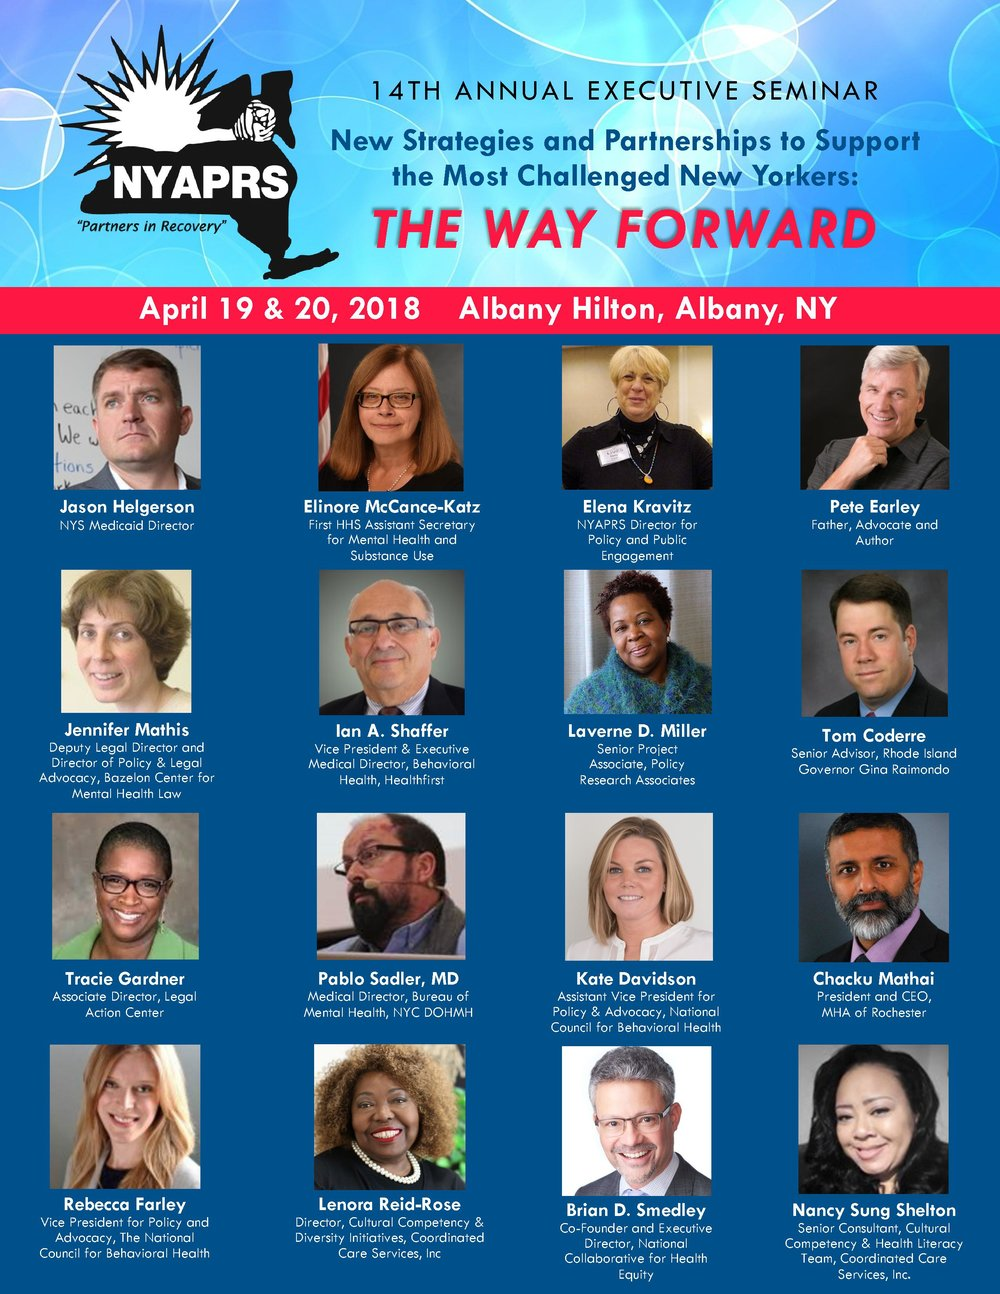 NYAPRS 2018 Executive Seminar Program.jpg